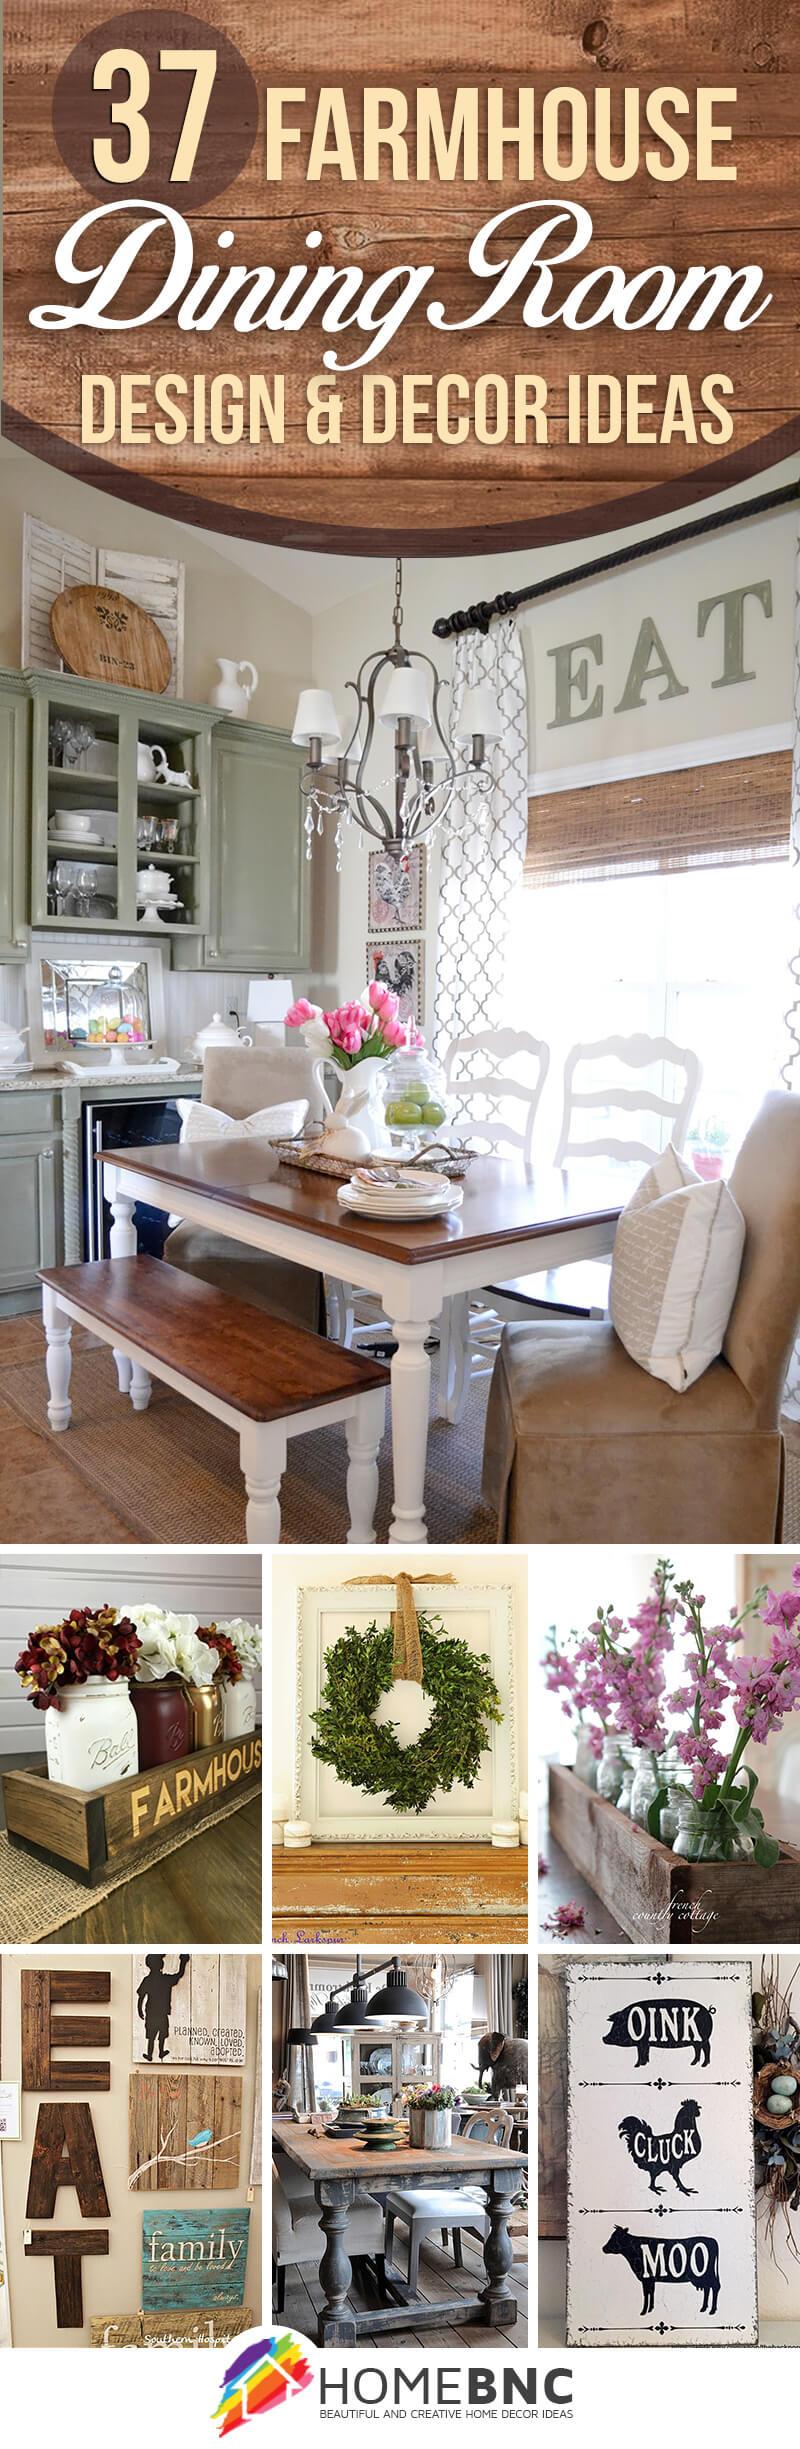 37 Best Farmhouse Dining Room Design and Decor Ideas for 2017 on Dining Room Curtains Farmhouse  id=14321